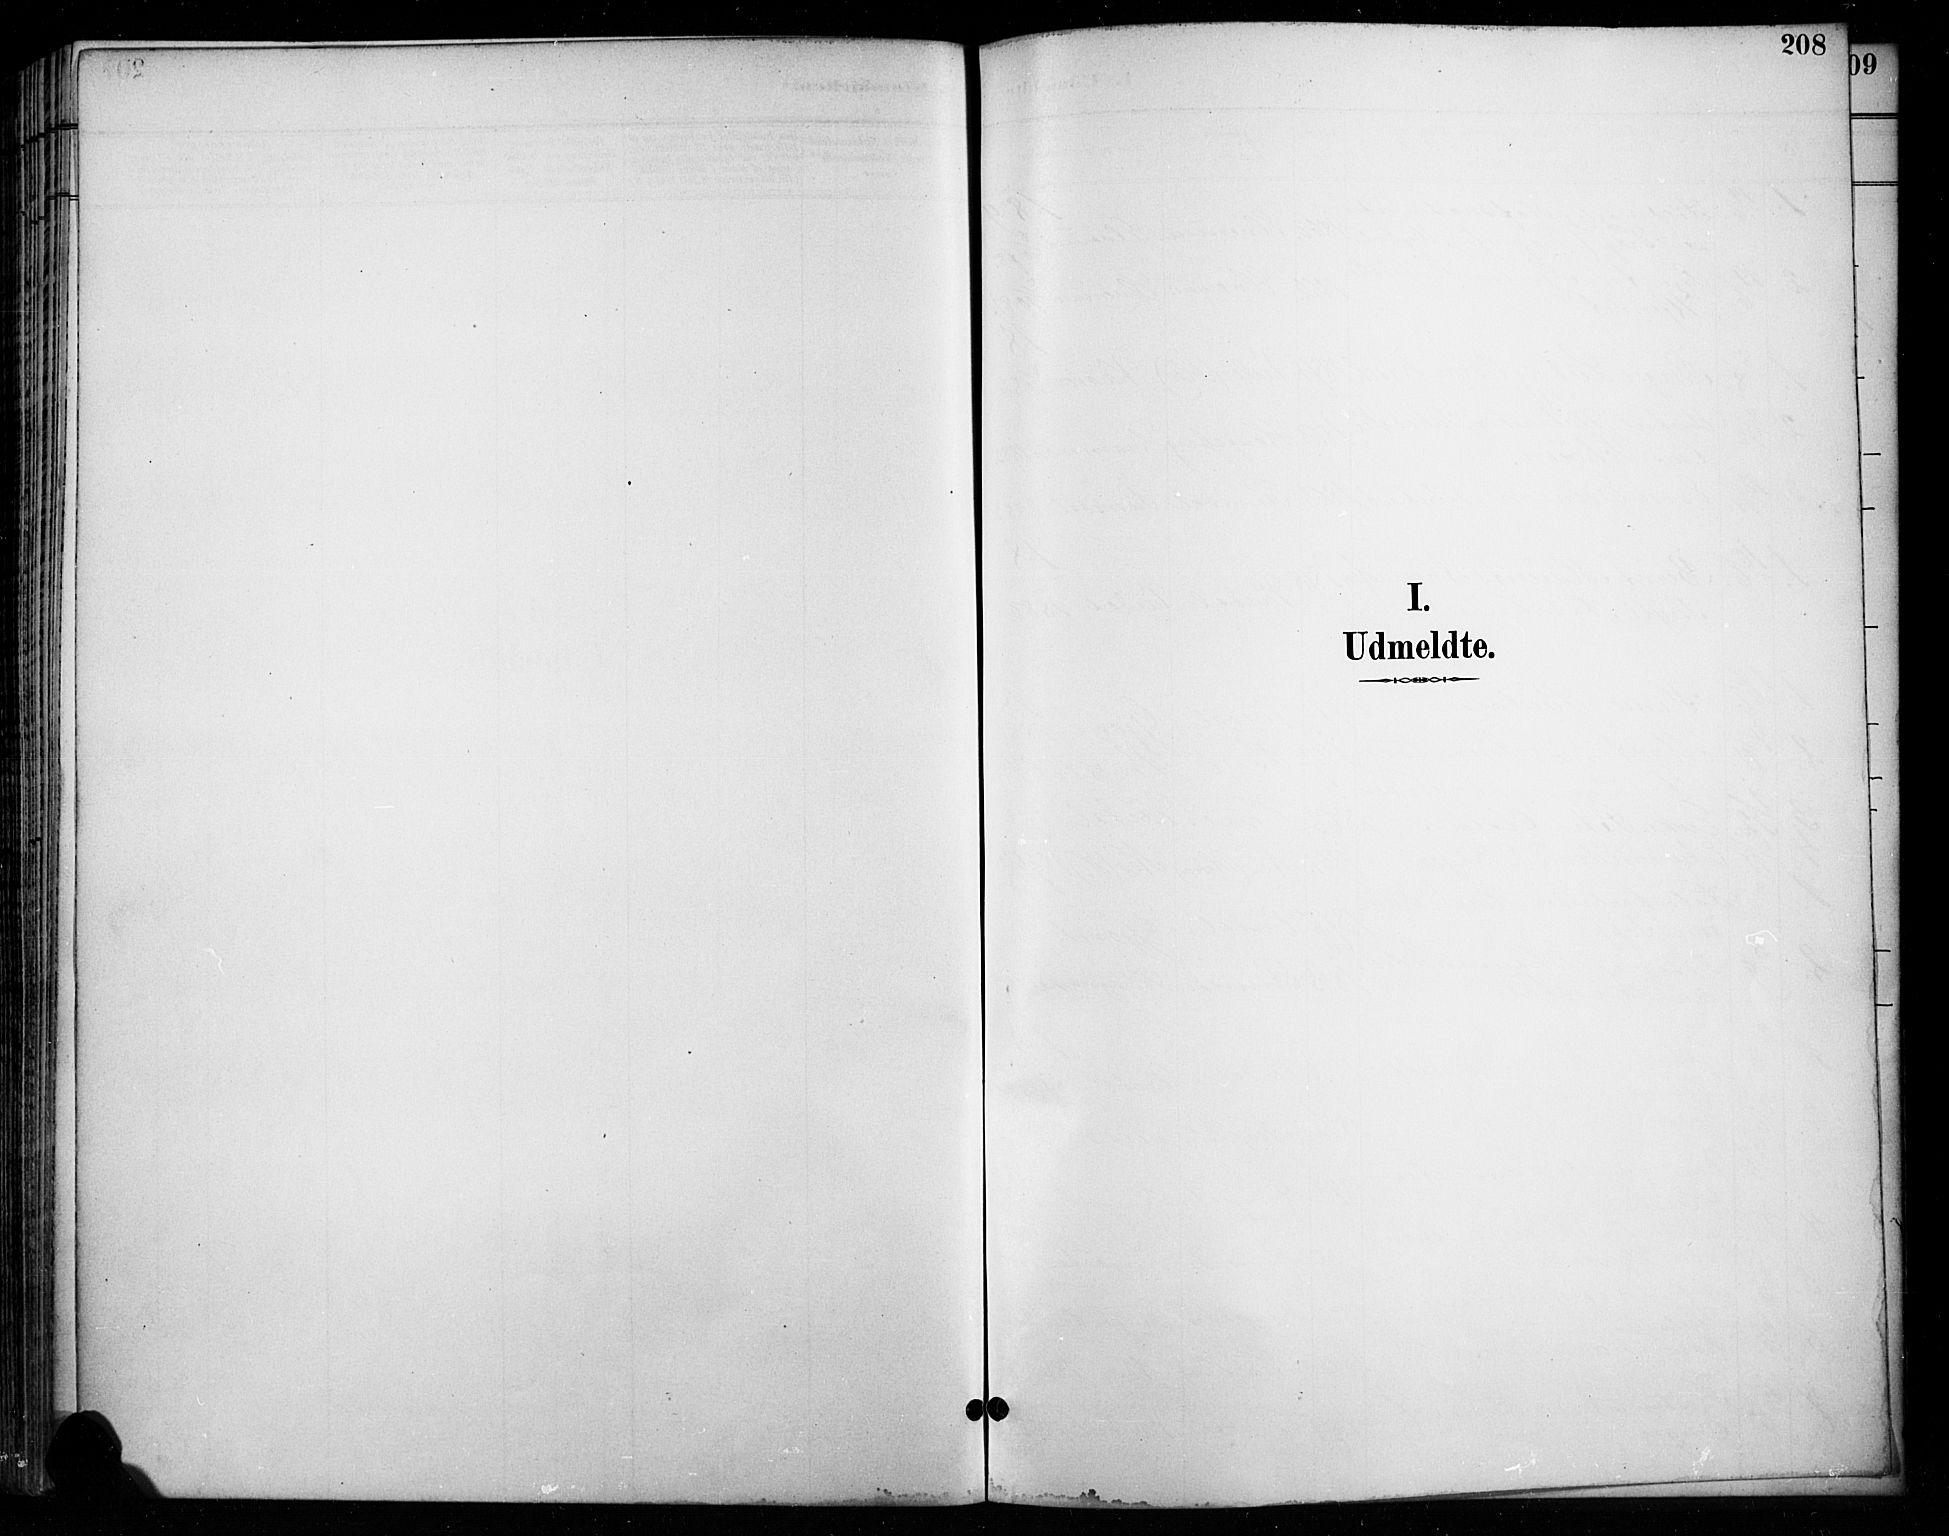 SAH, Vardal prestekontor, H/Ha/Haa/L0011: Ministerialbok nr. 11, 1891-1901, s. 208